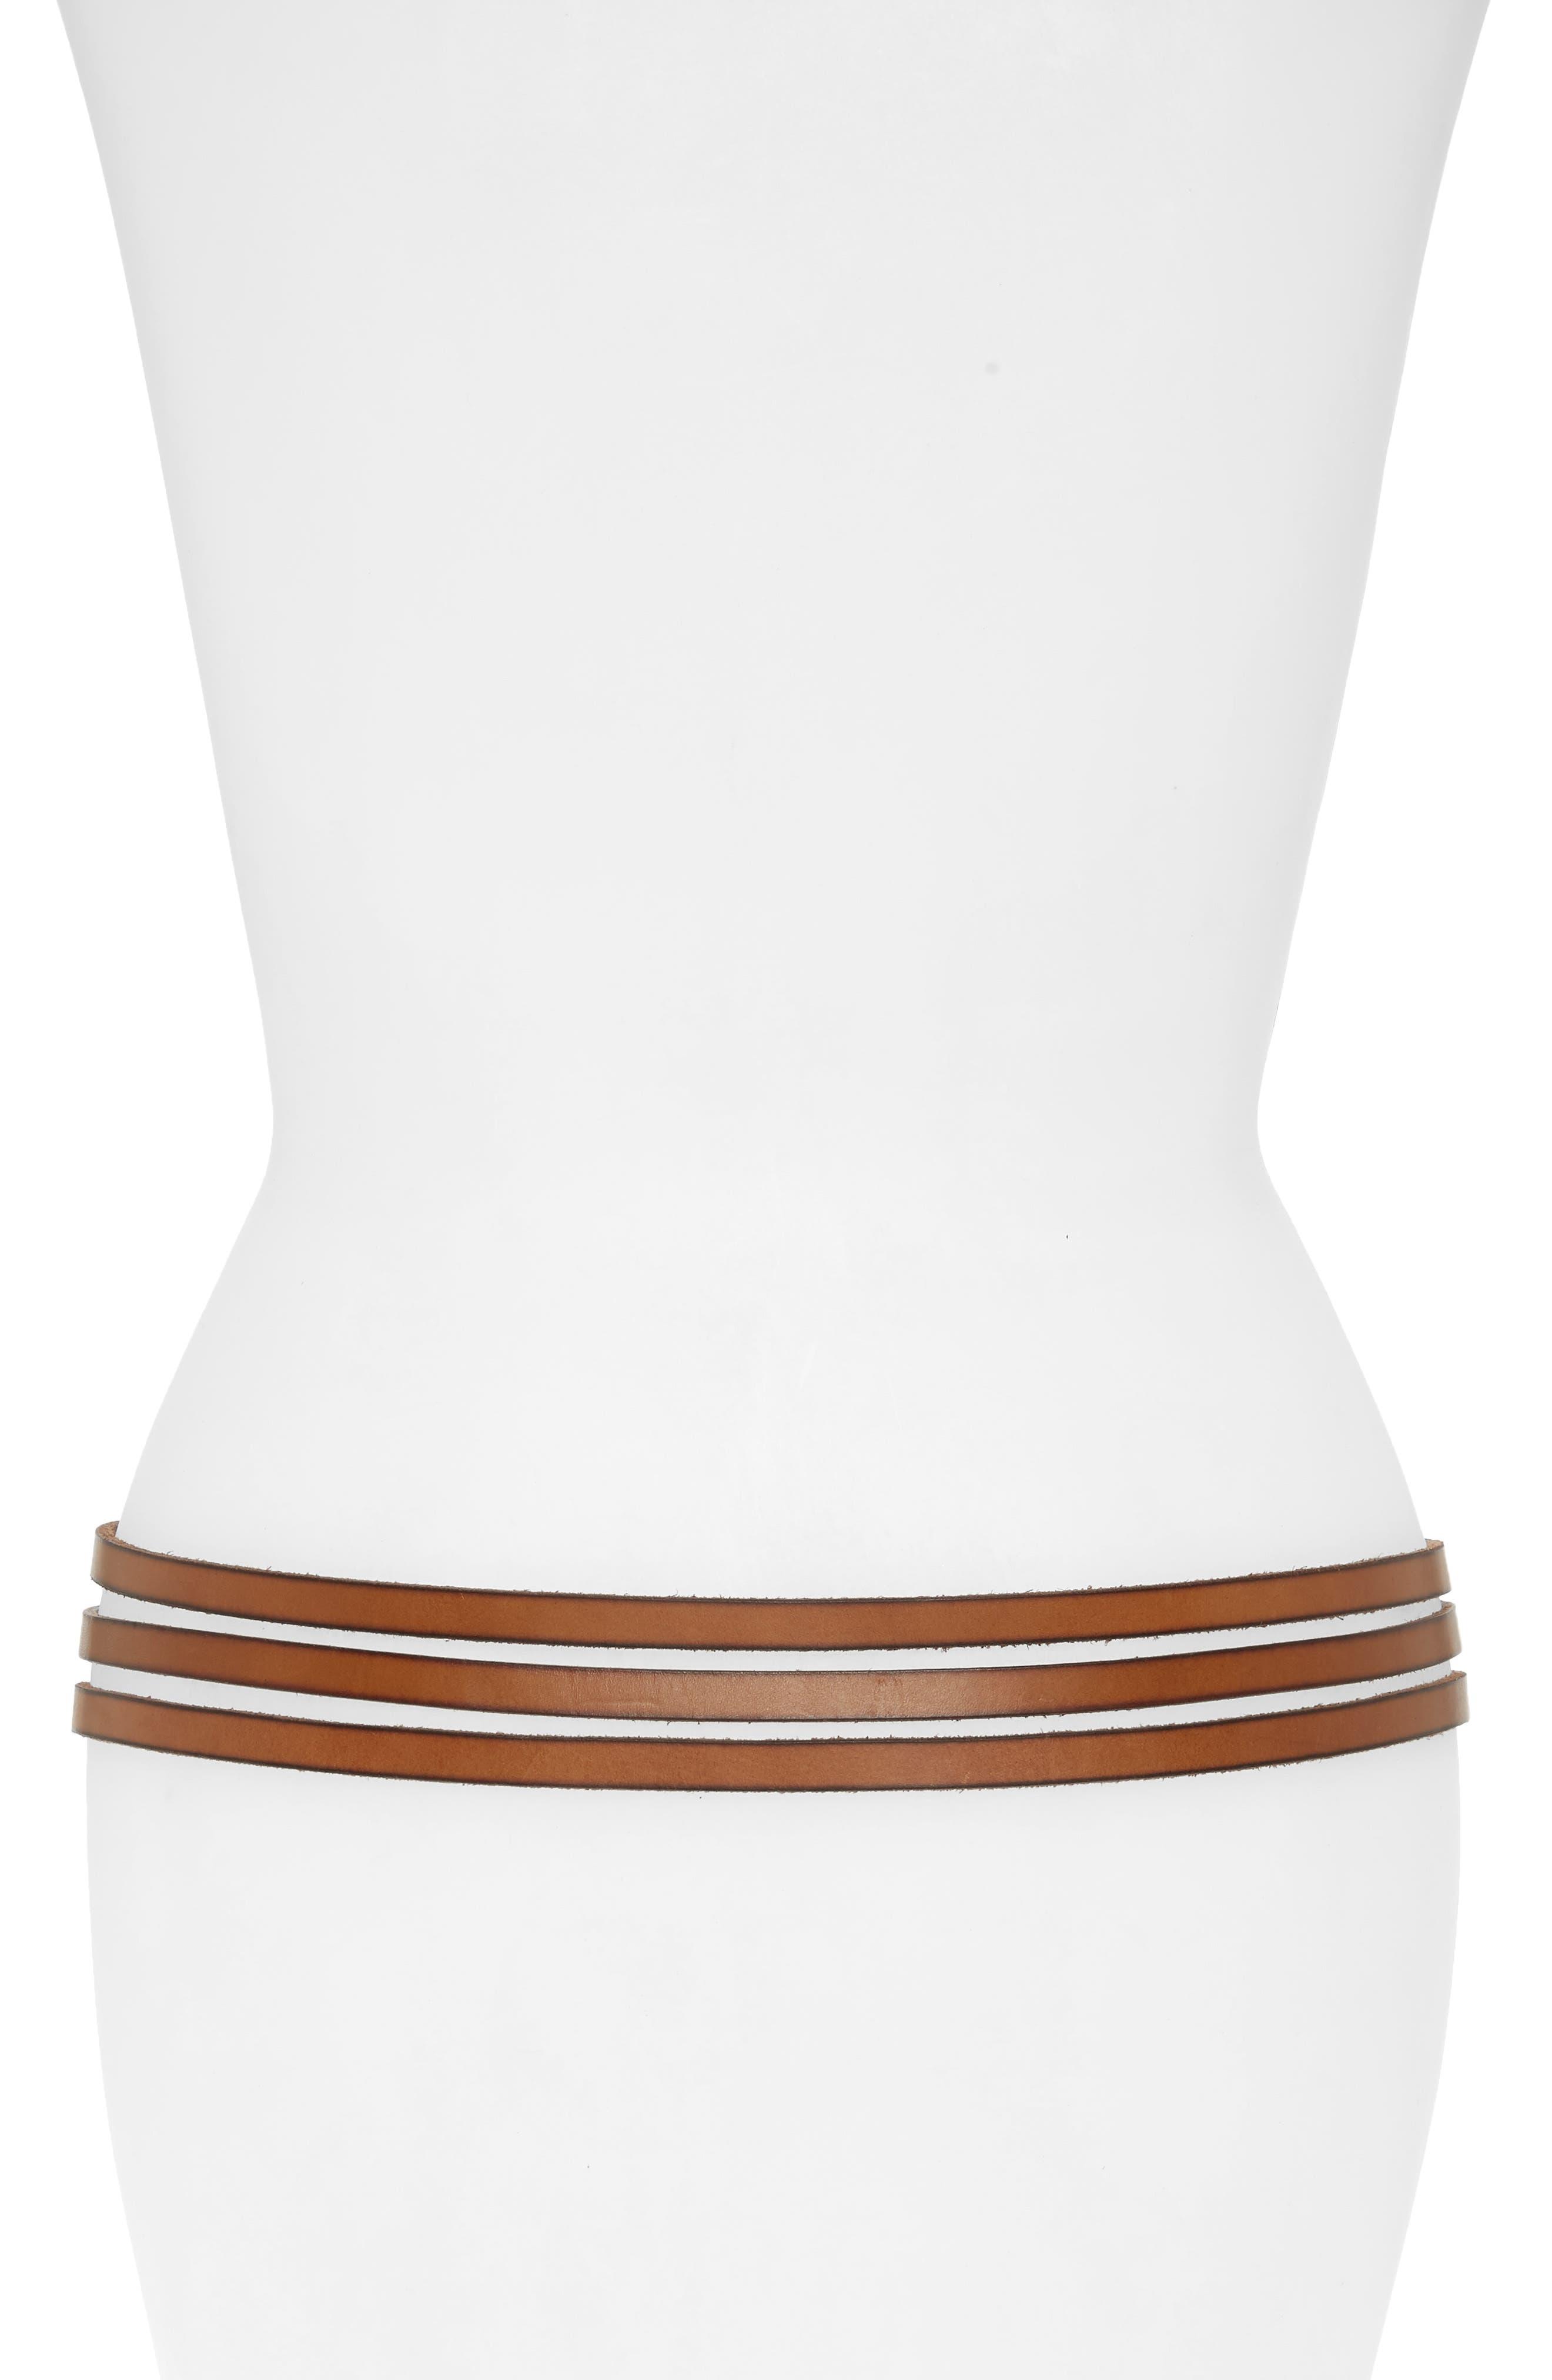 Multi Strap Leather Belt,                             Alternate thumbnail 2, color,                             Tan